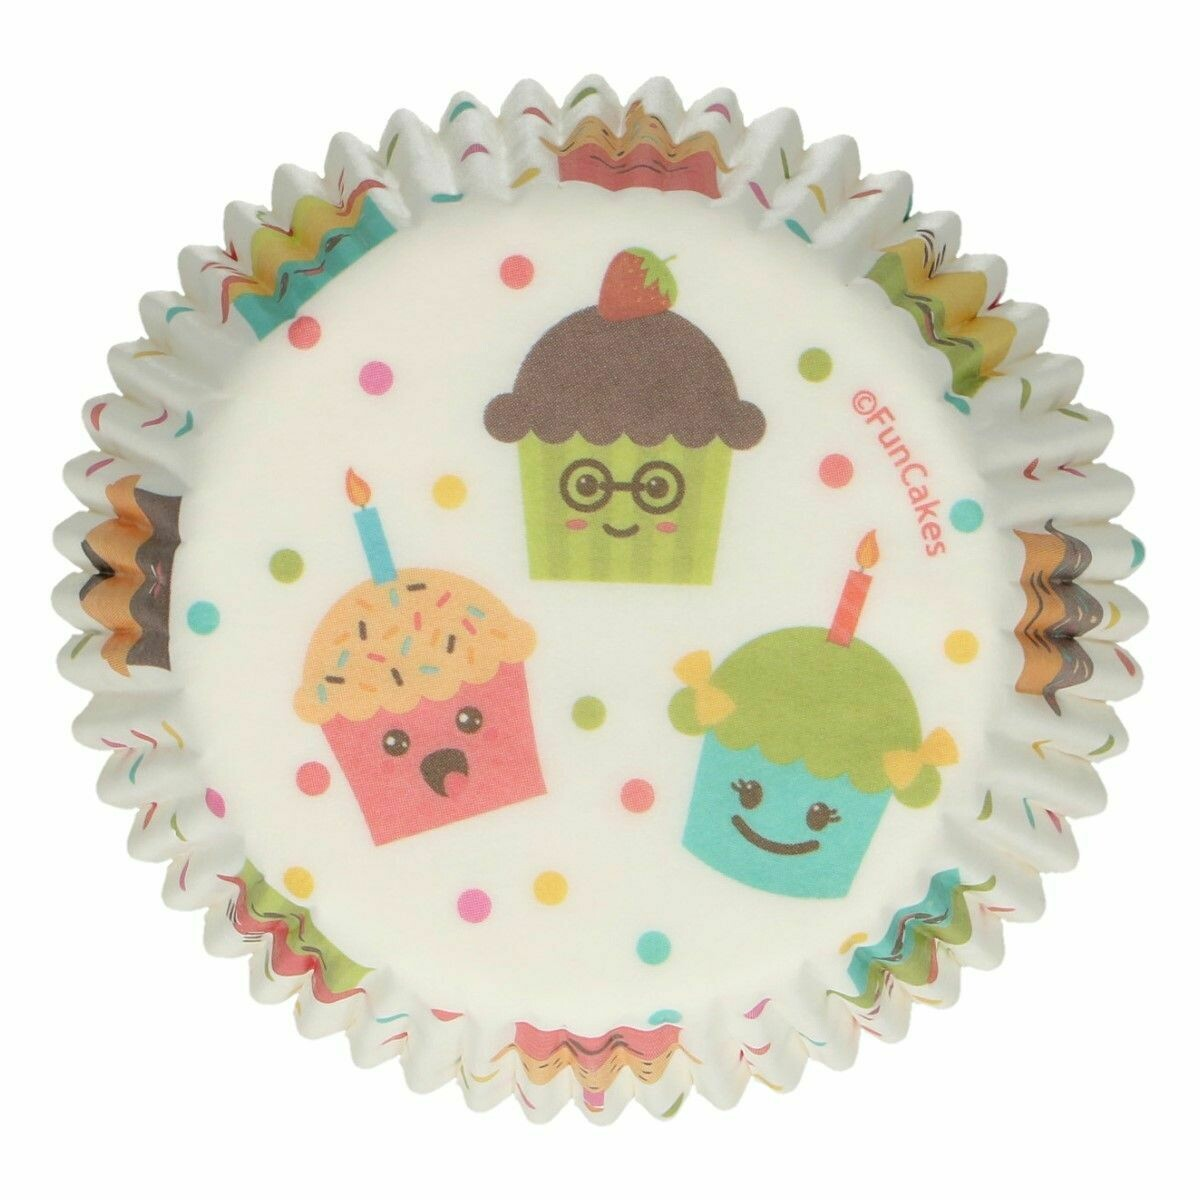 SALE!!! FunCakes Cupcake Cases -CUPCAKE PARTY -Θήκες Ψησίματος -48 τεμ